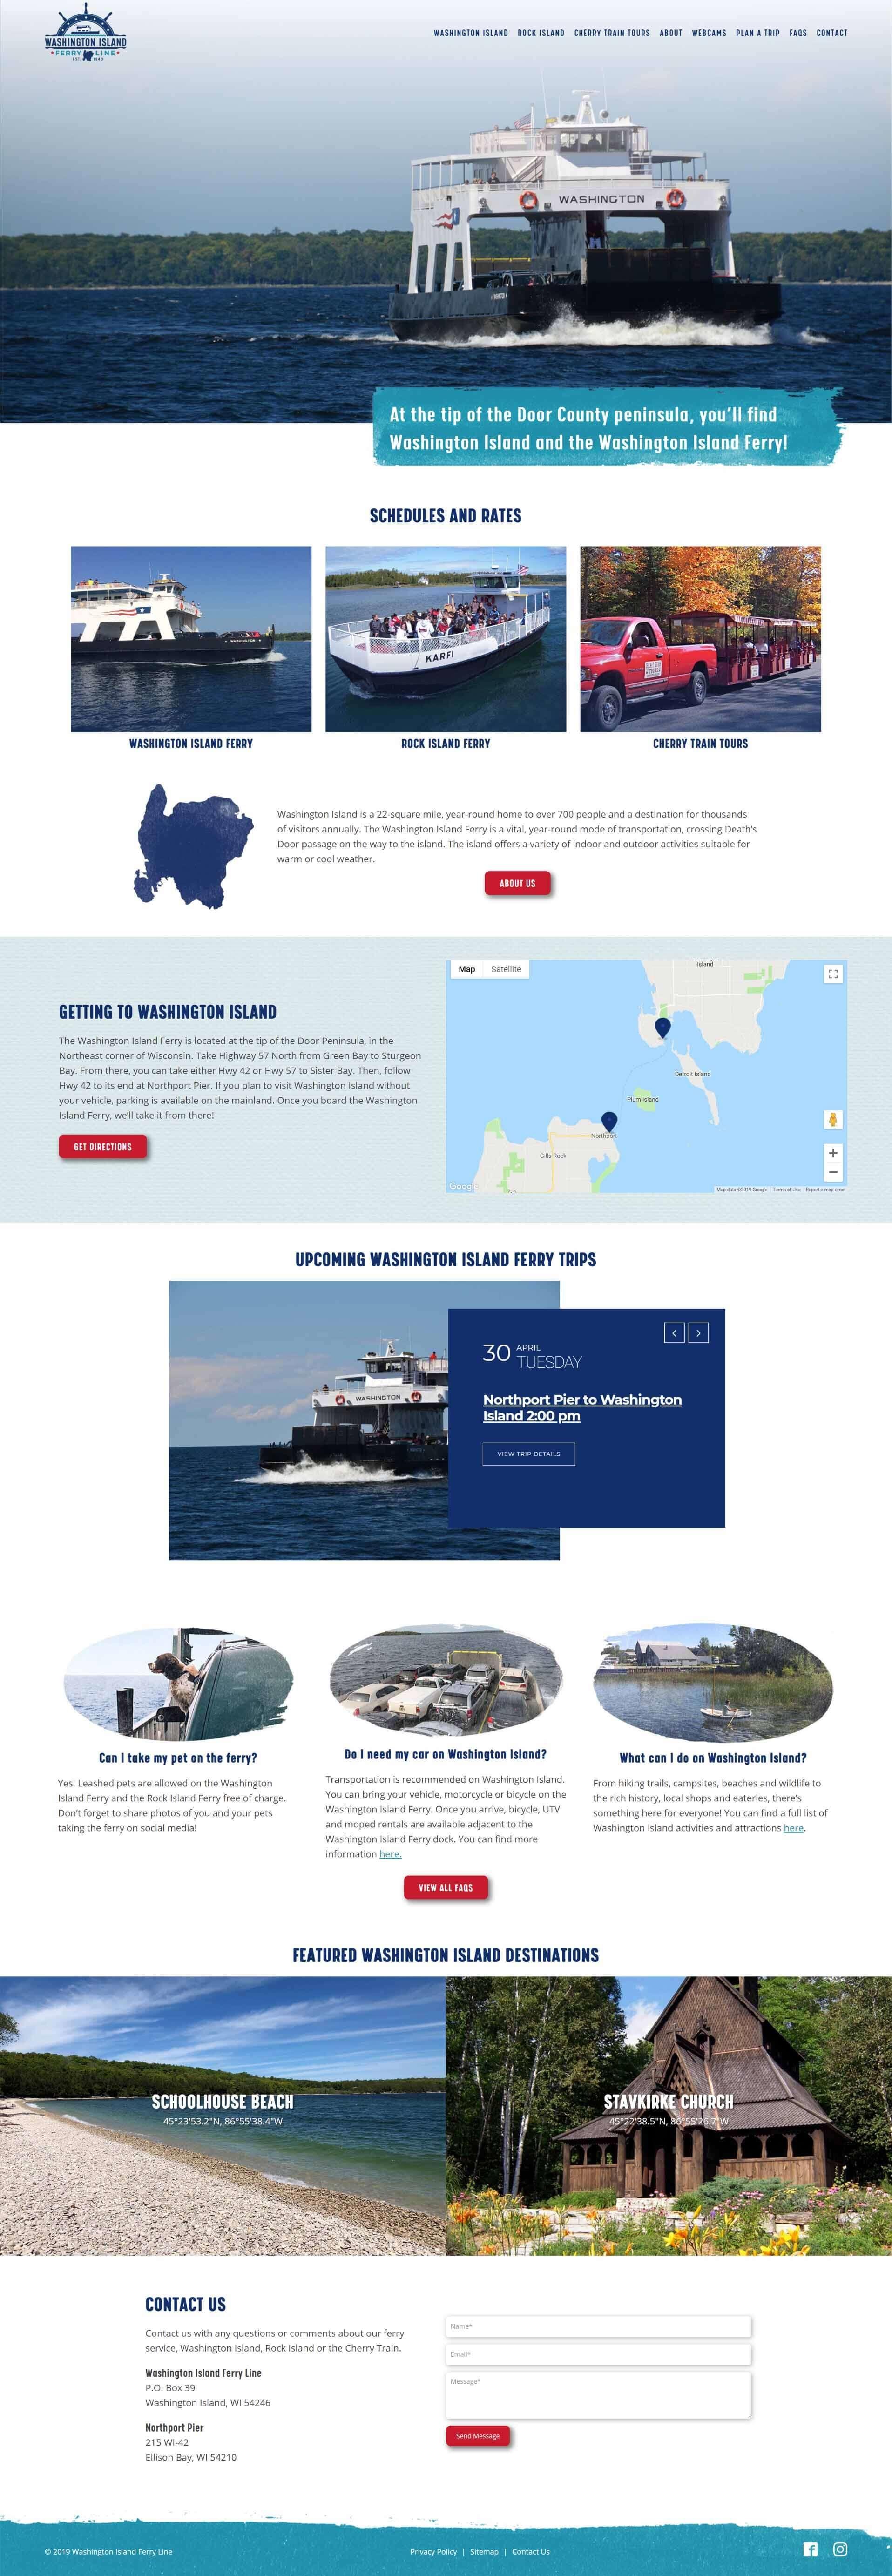 Washington Island Ferry new homepage